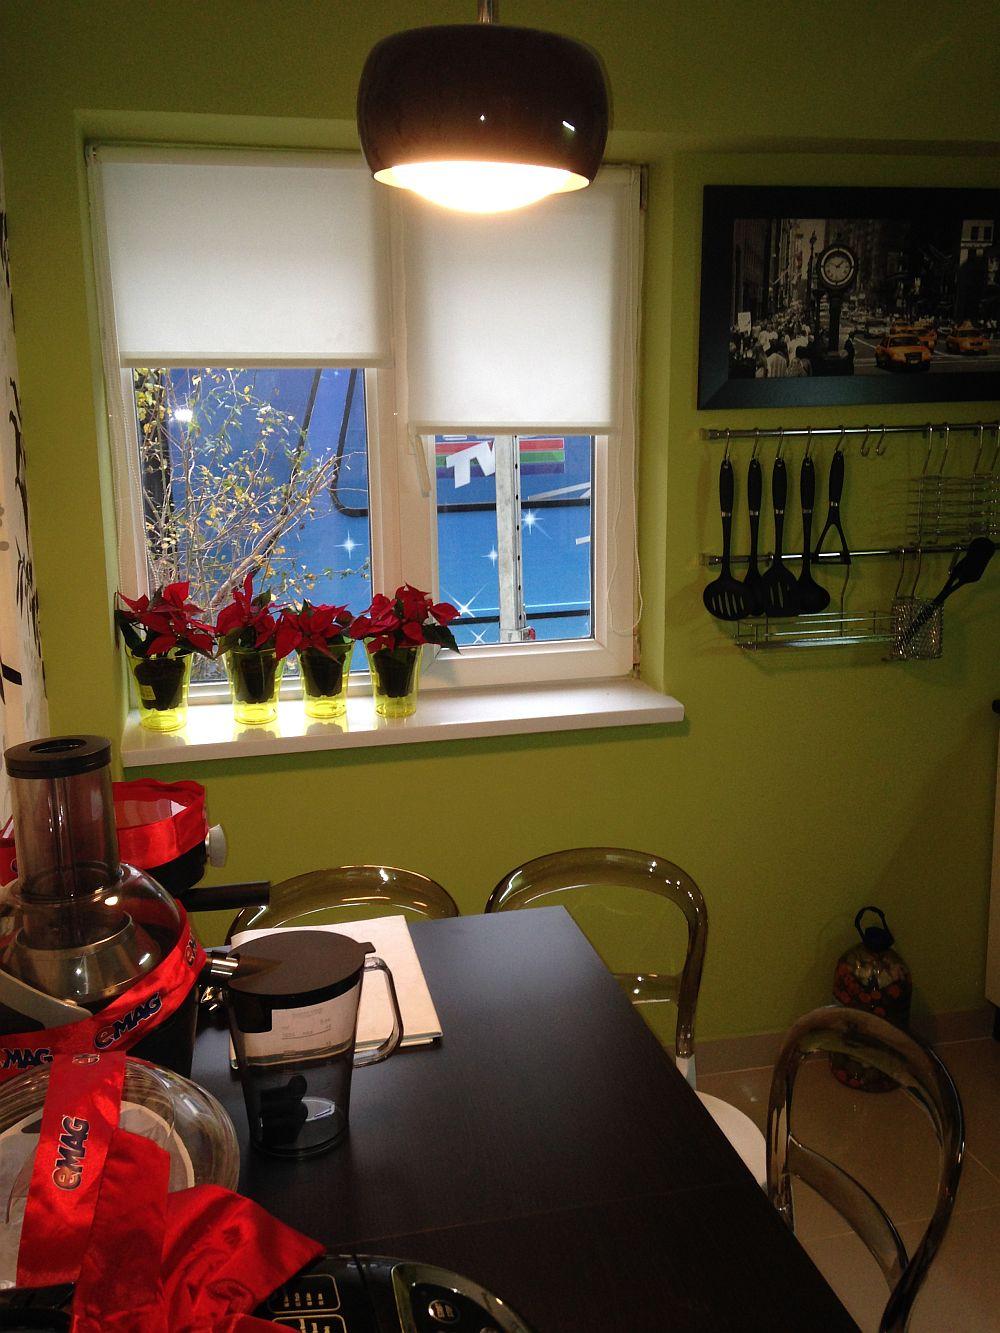 adelaparvu.com despre apartmentul Liliana Ion din emisiunea Visuri la cheie, proTV, senzonul 1, 2014 (51)